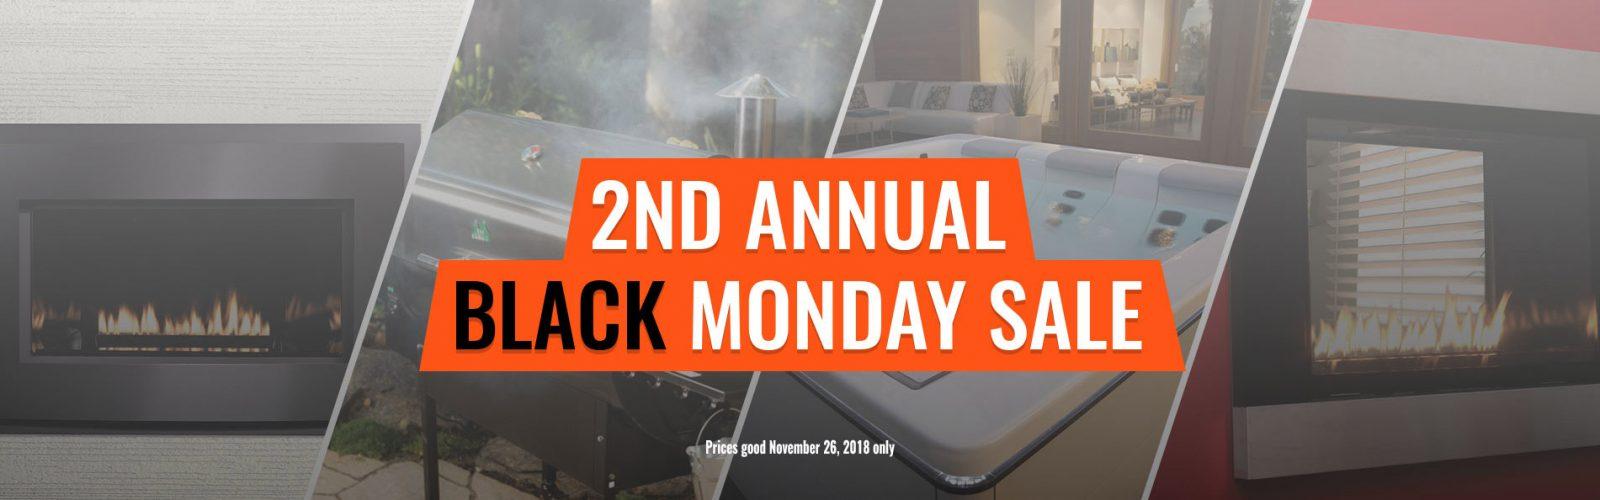 Nick's 2nd Annual Black Monday Sale